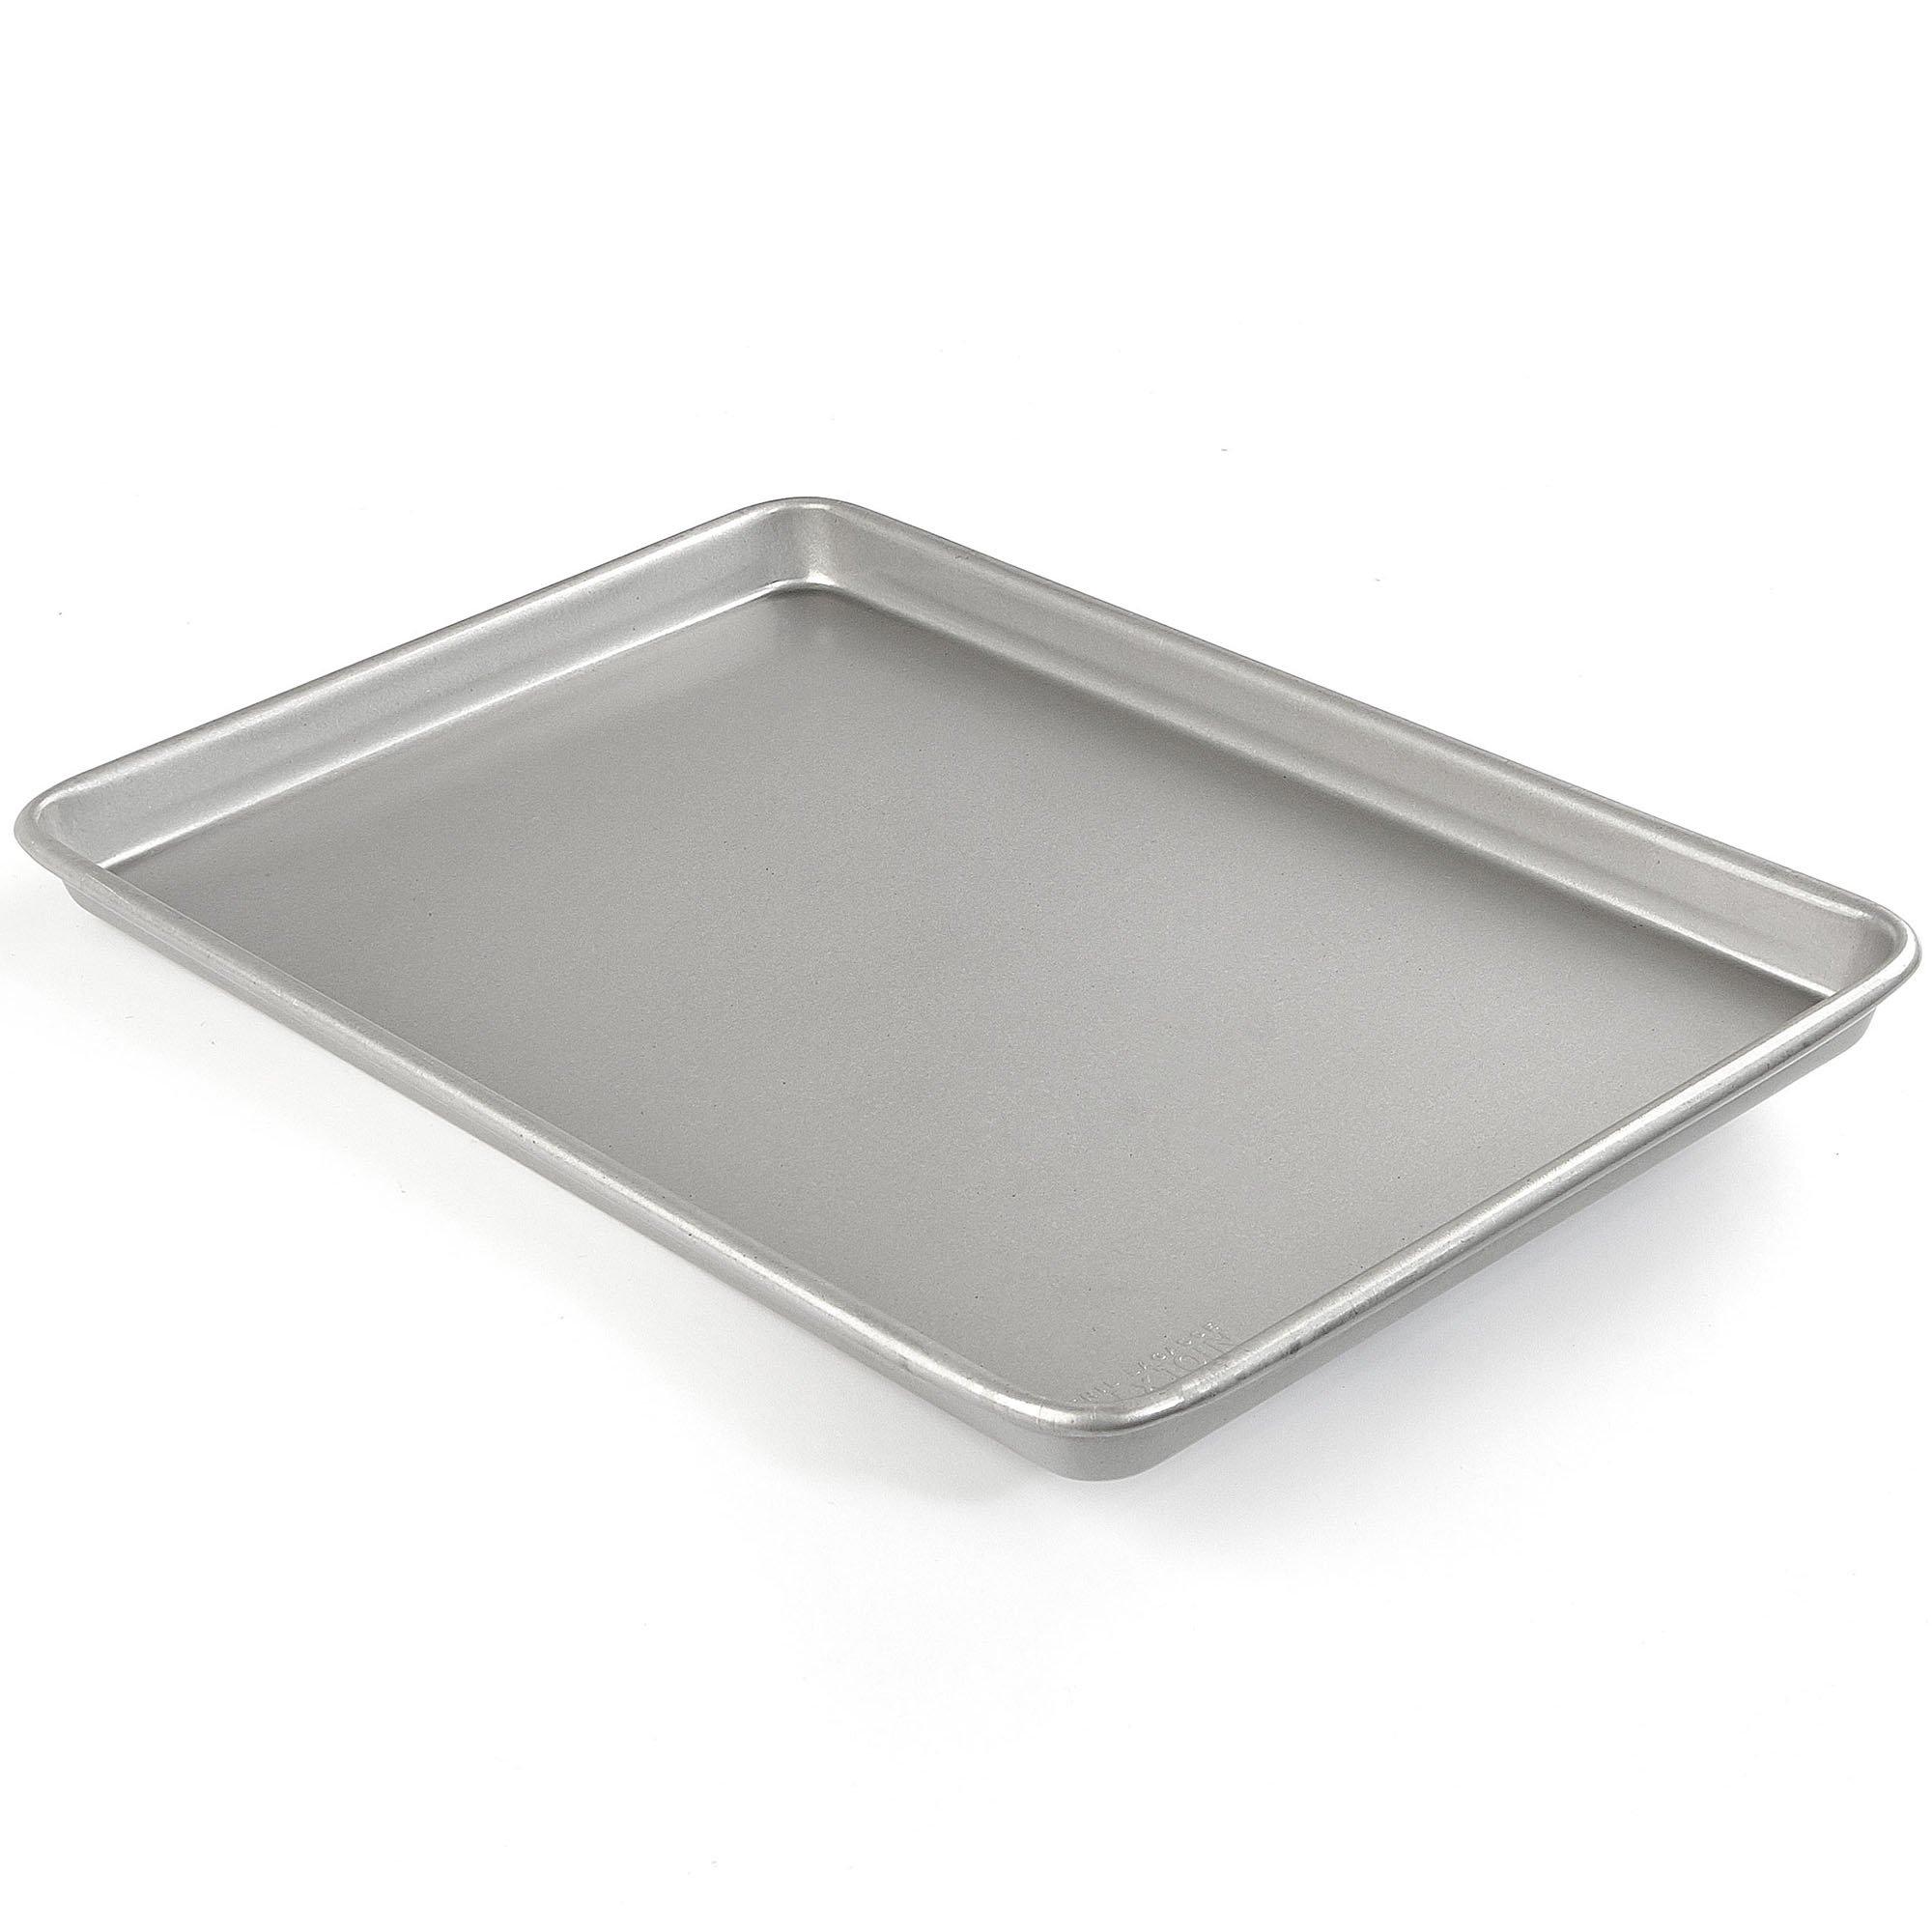 Emeril Lagasse 62670 Aluminized Steel Nonstick 5-Piece Bakeware Set by Emeril Lagasse (Image #2)